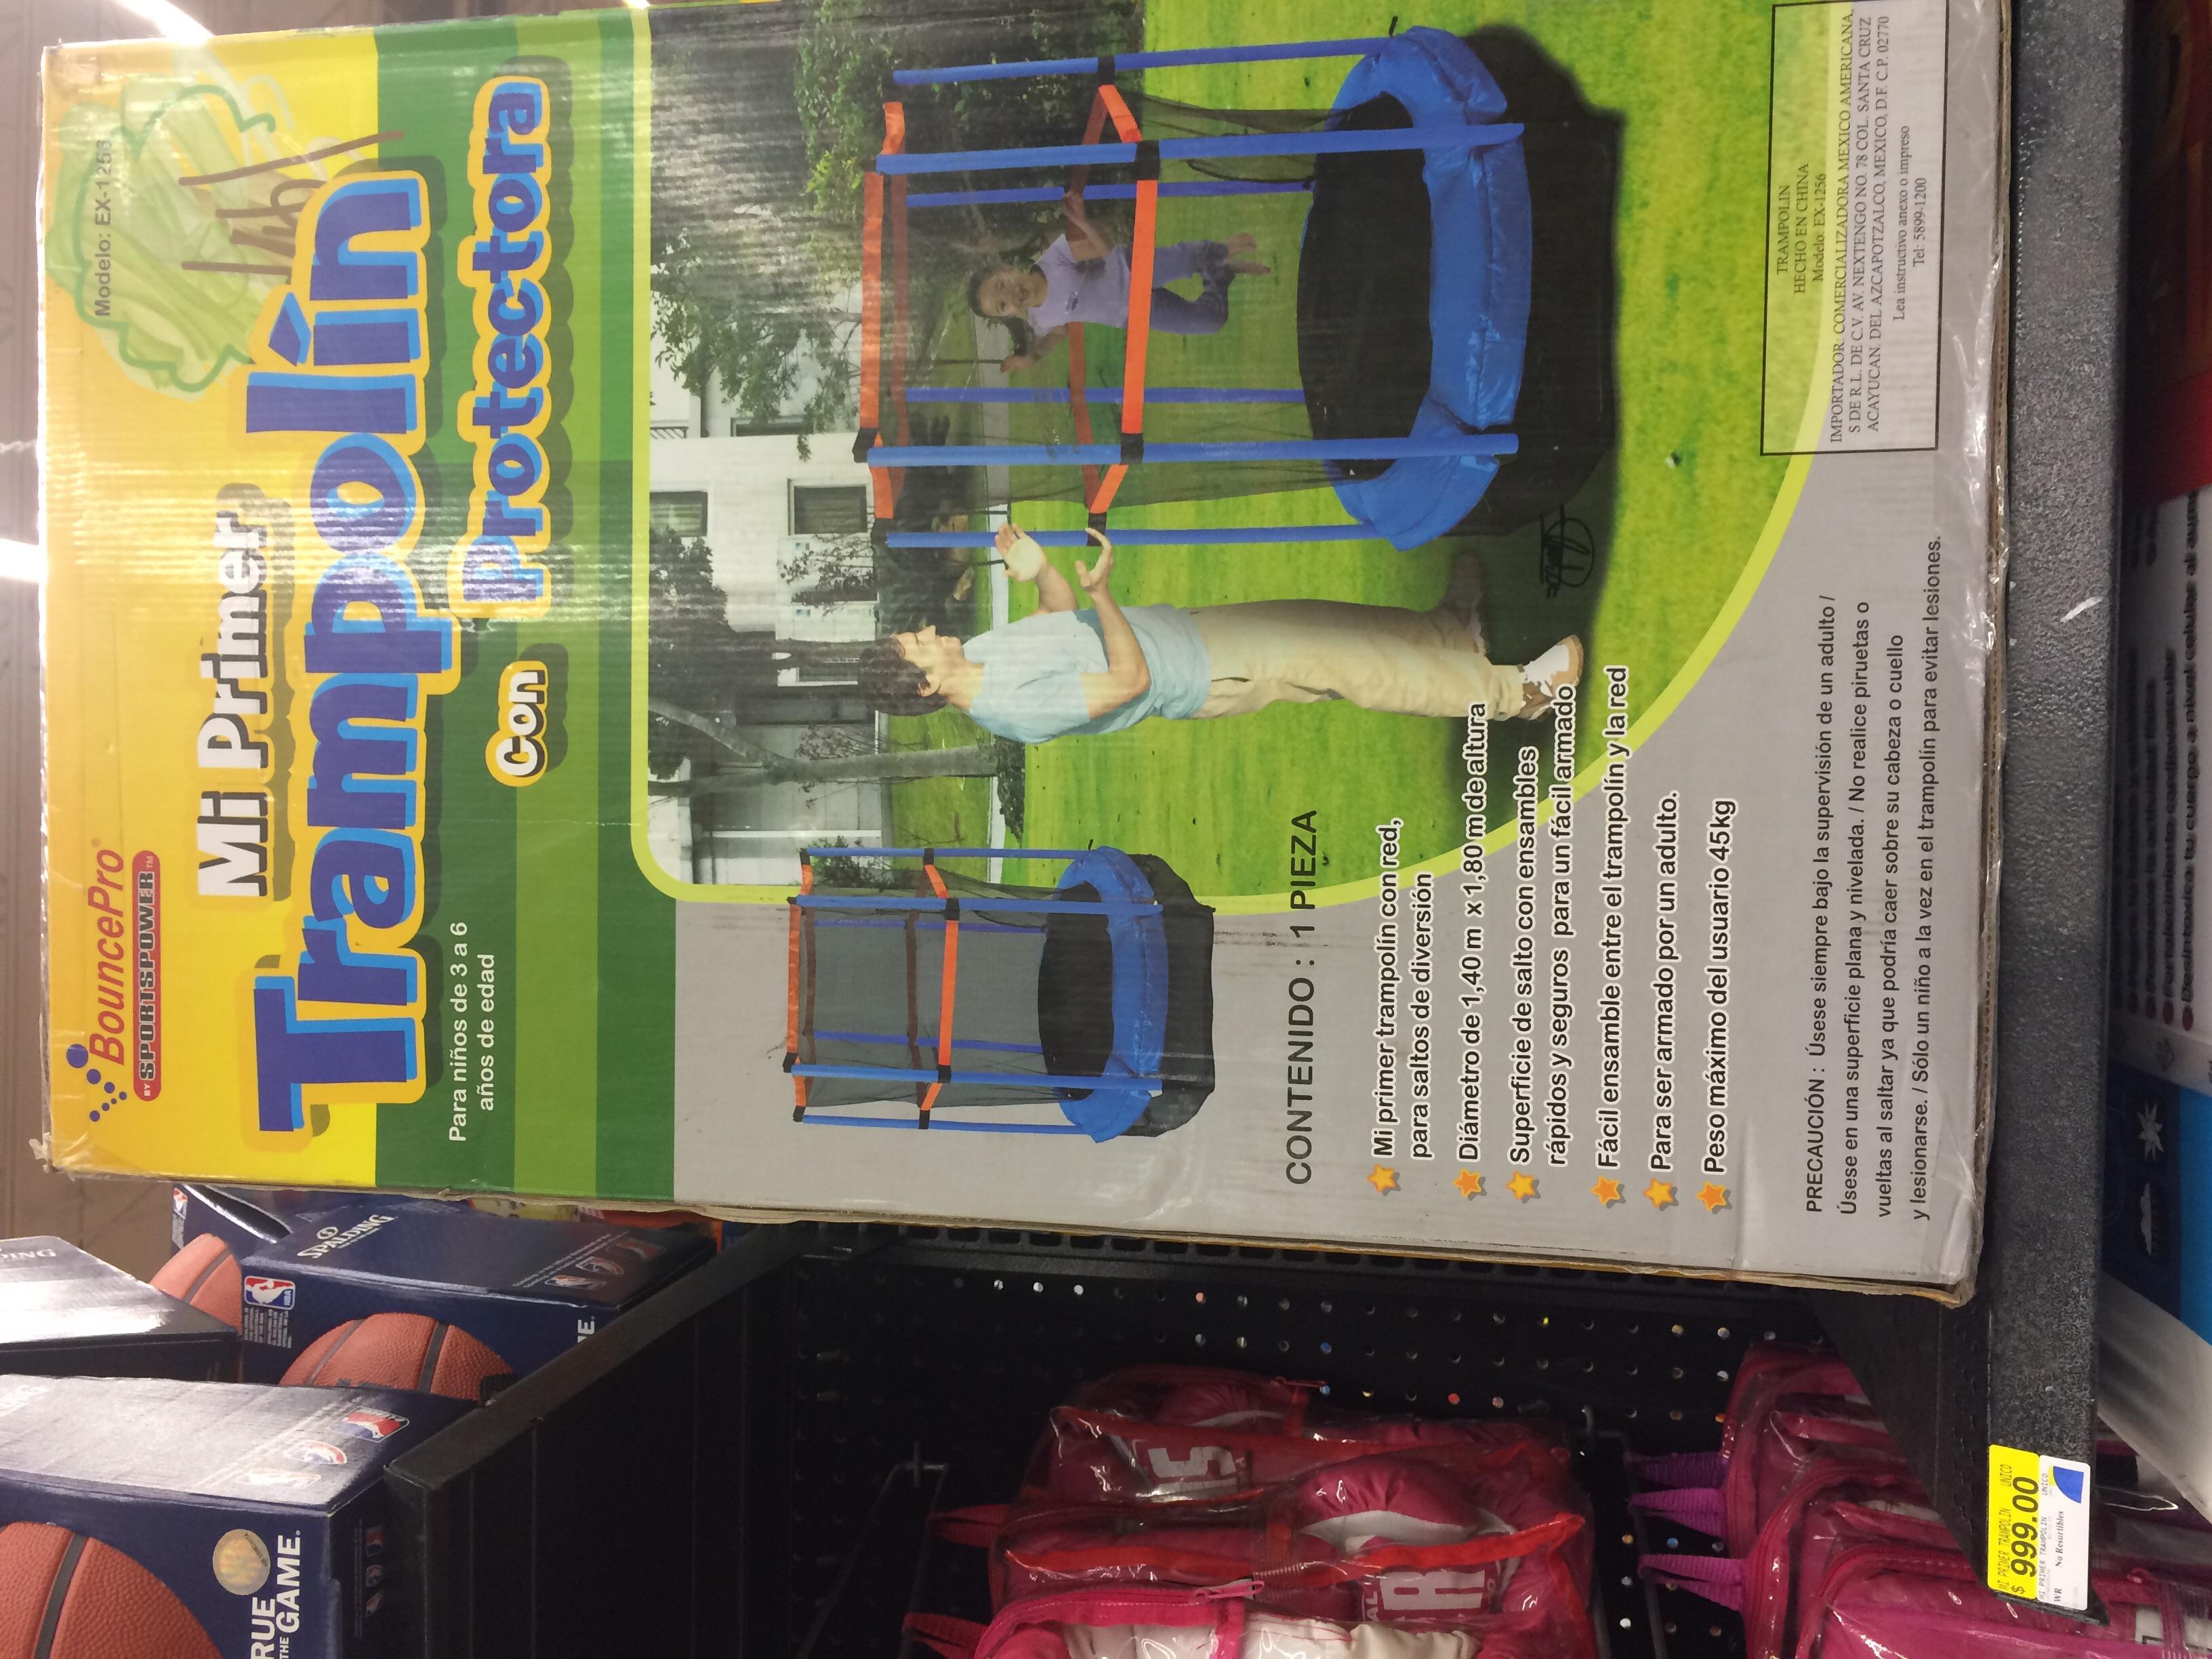 Walmart Mi primer trampolín $999,00